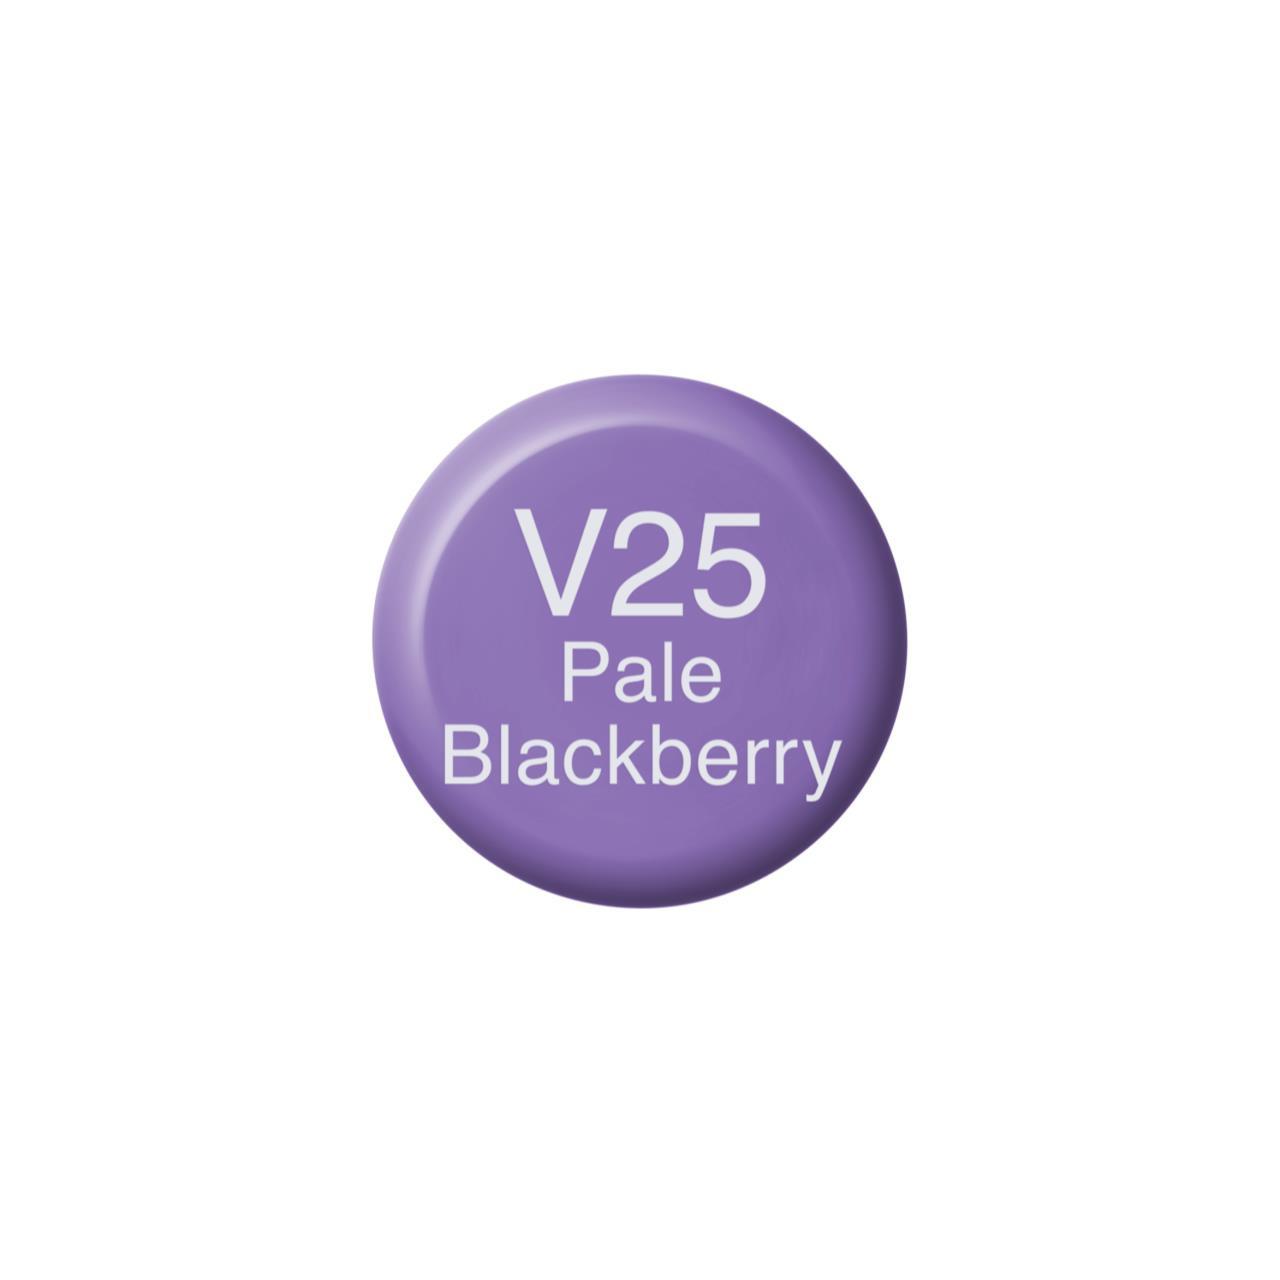 V25 Pale Blackberry, Copic Ink - 4511338058077